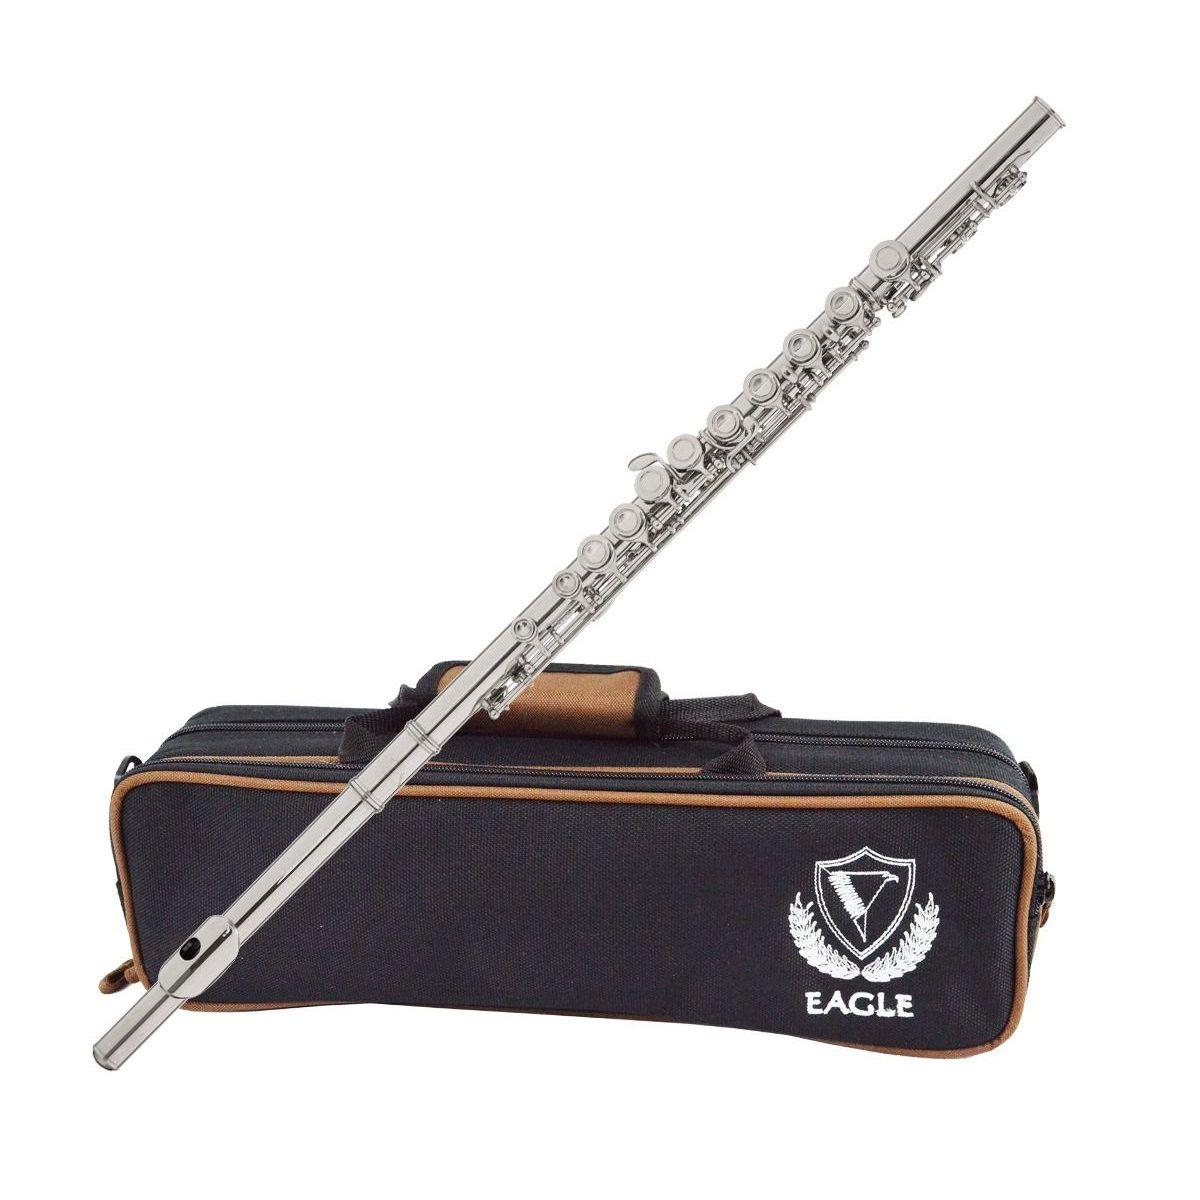 Flauta Transversal Eagle Fl03S Em Do Prateada